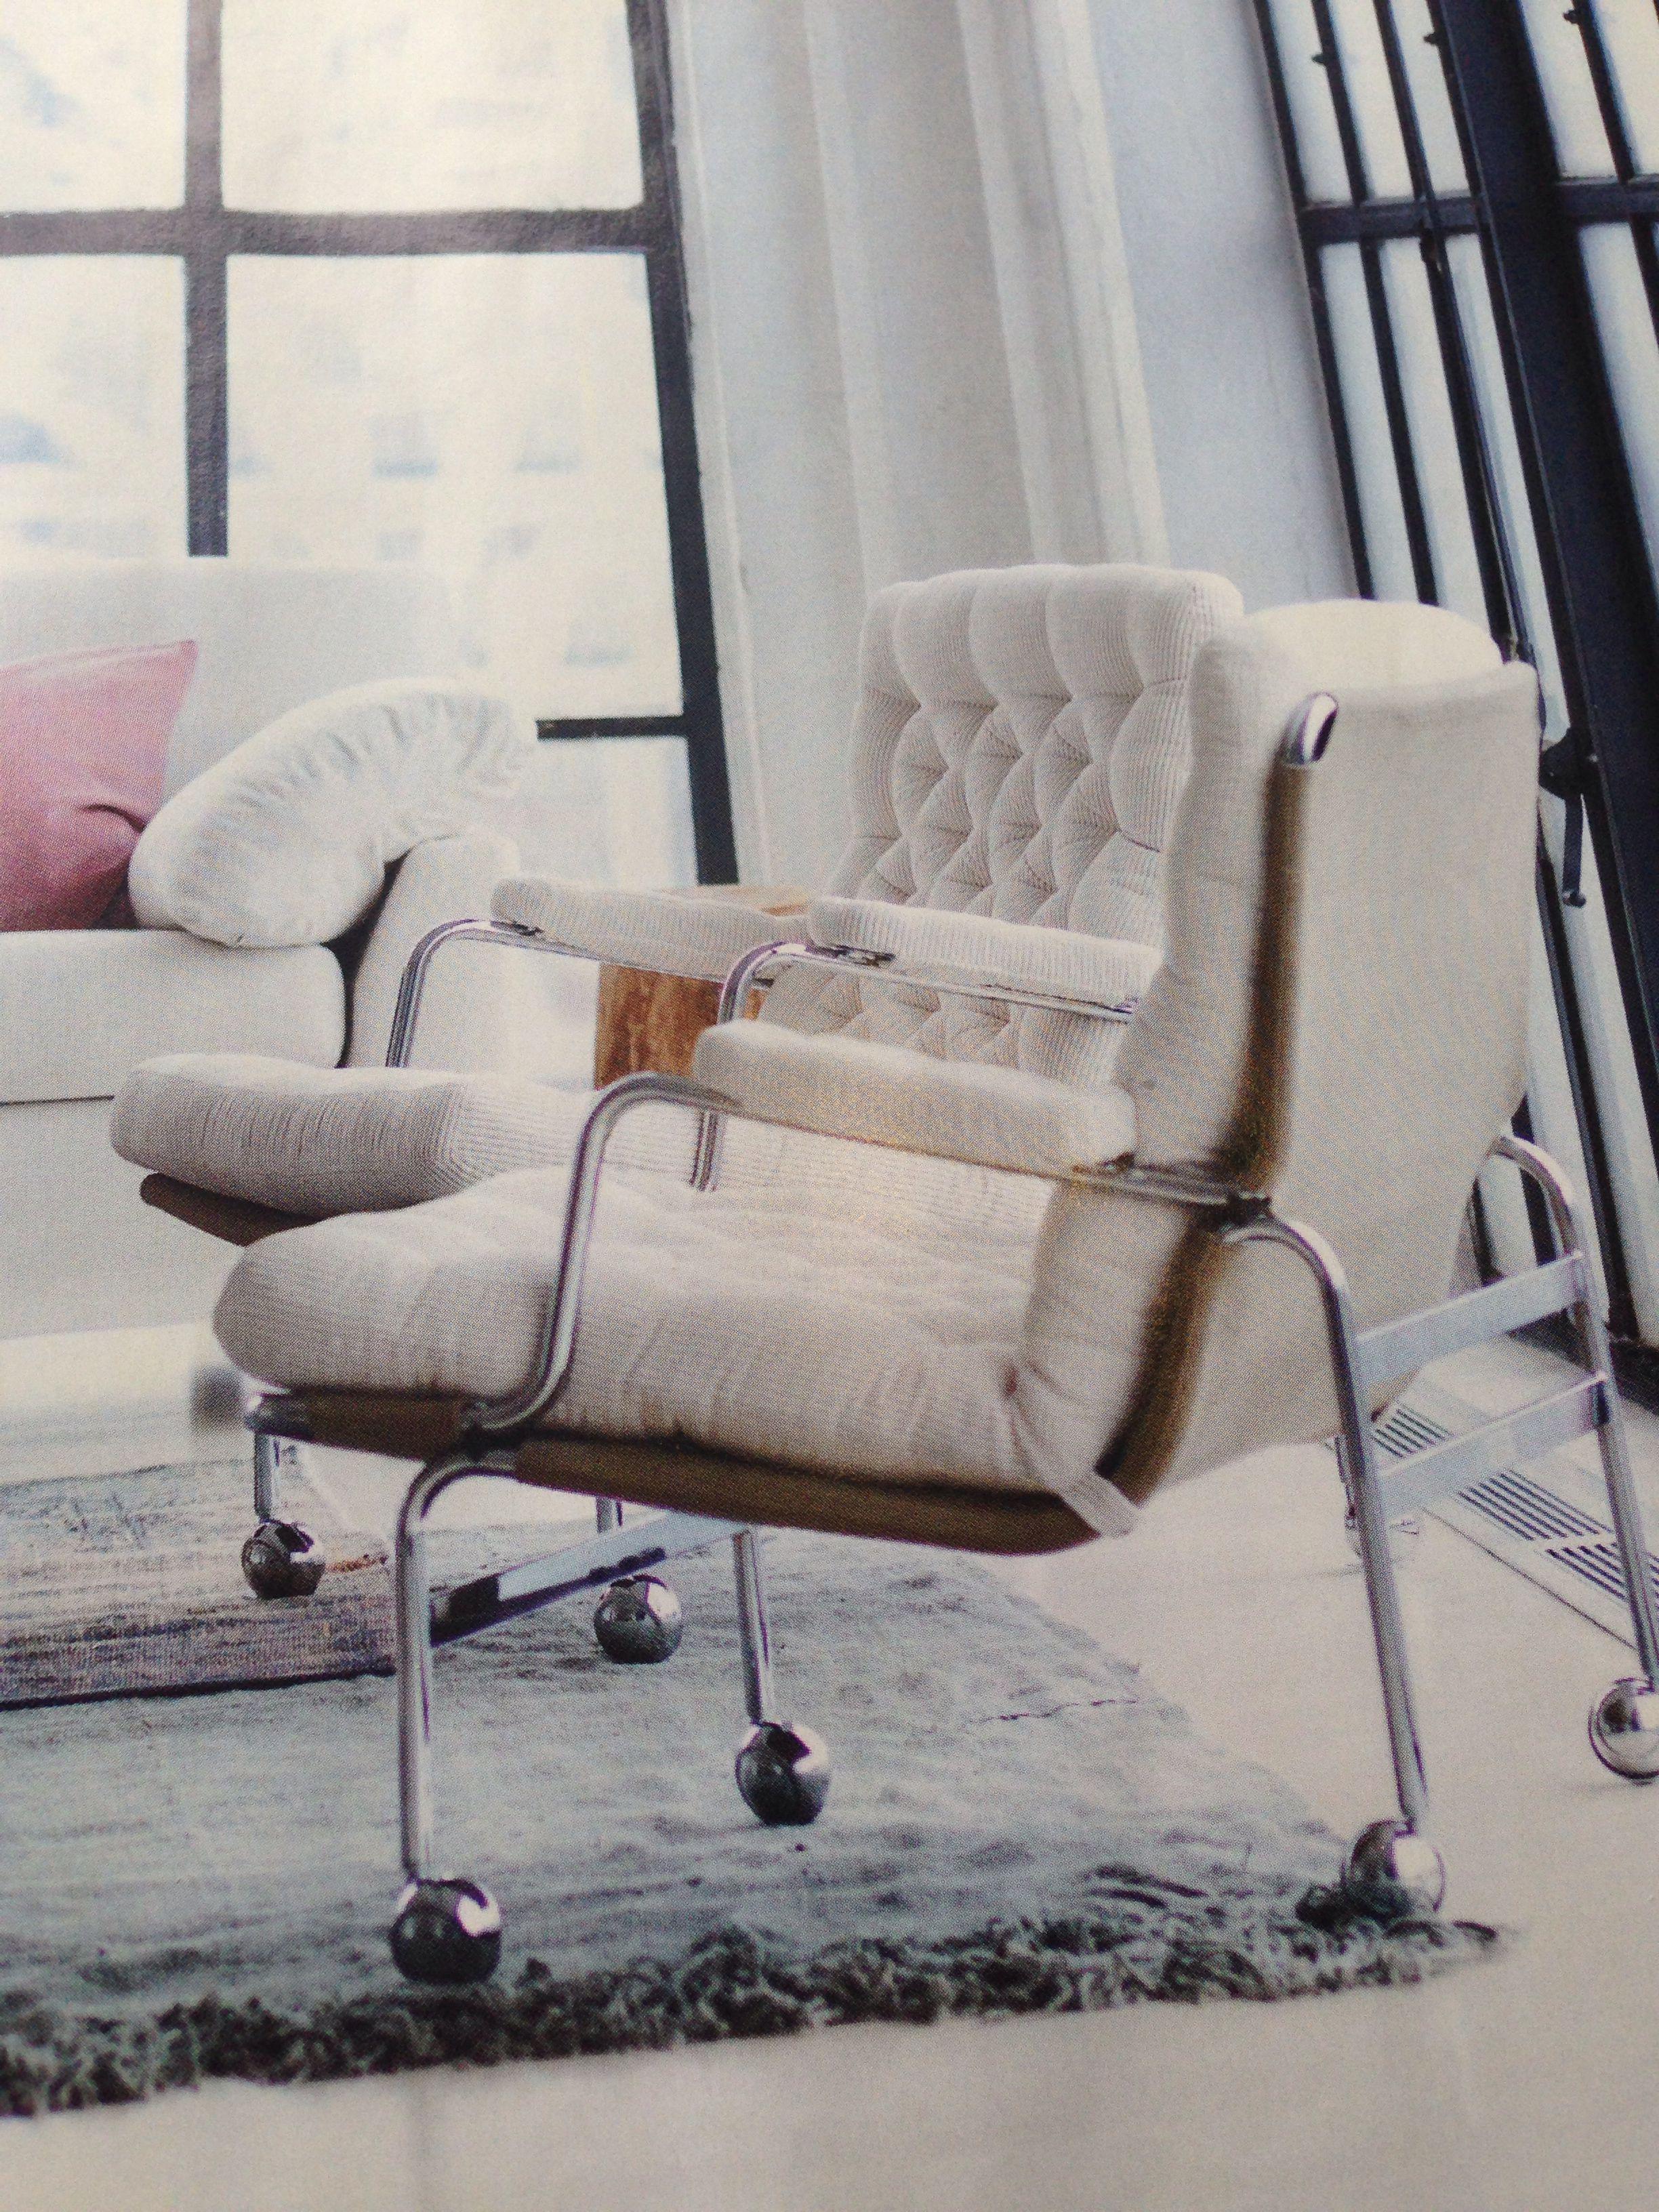 Dux fåtölj Karin House Mood Board Pinterest Mood boards, Interiors and House